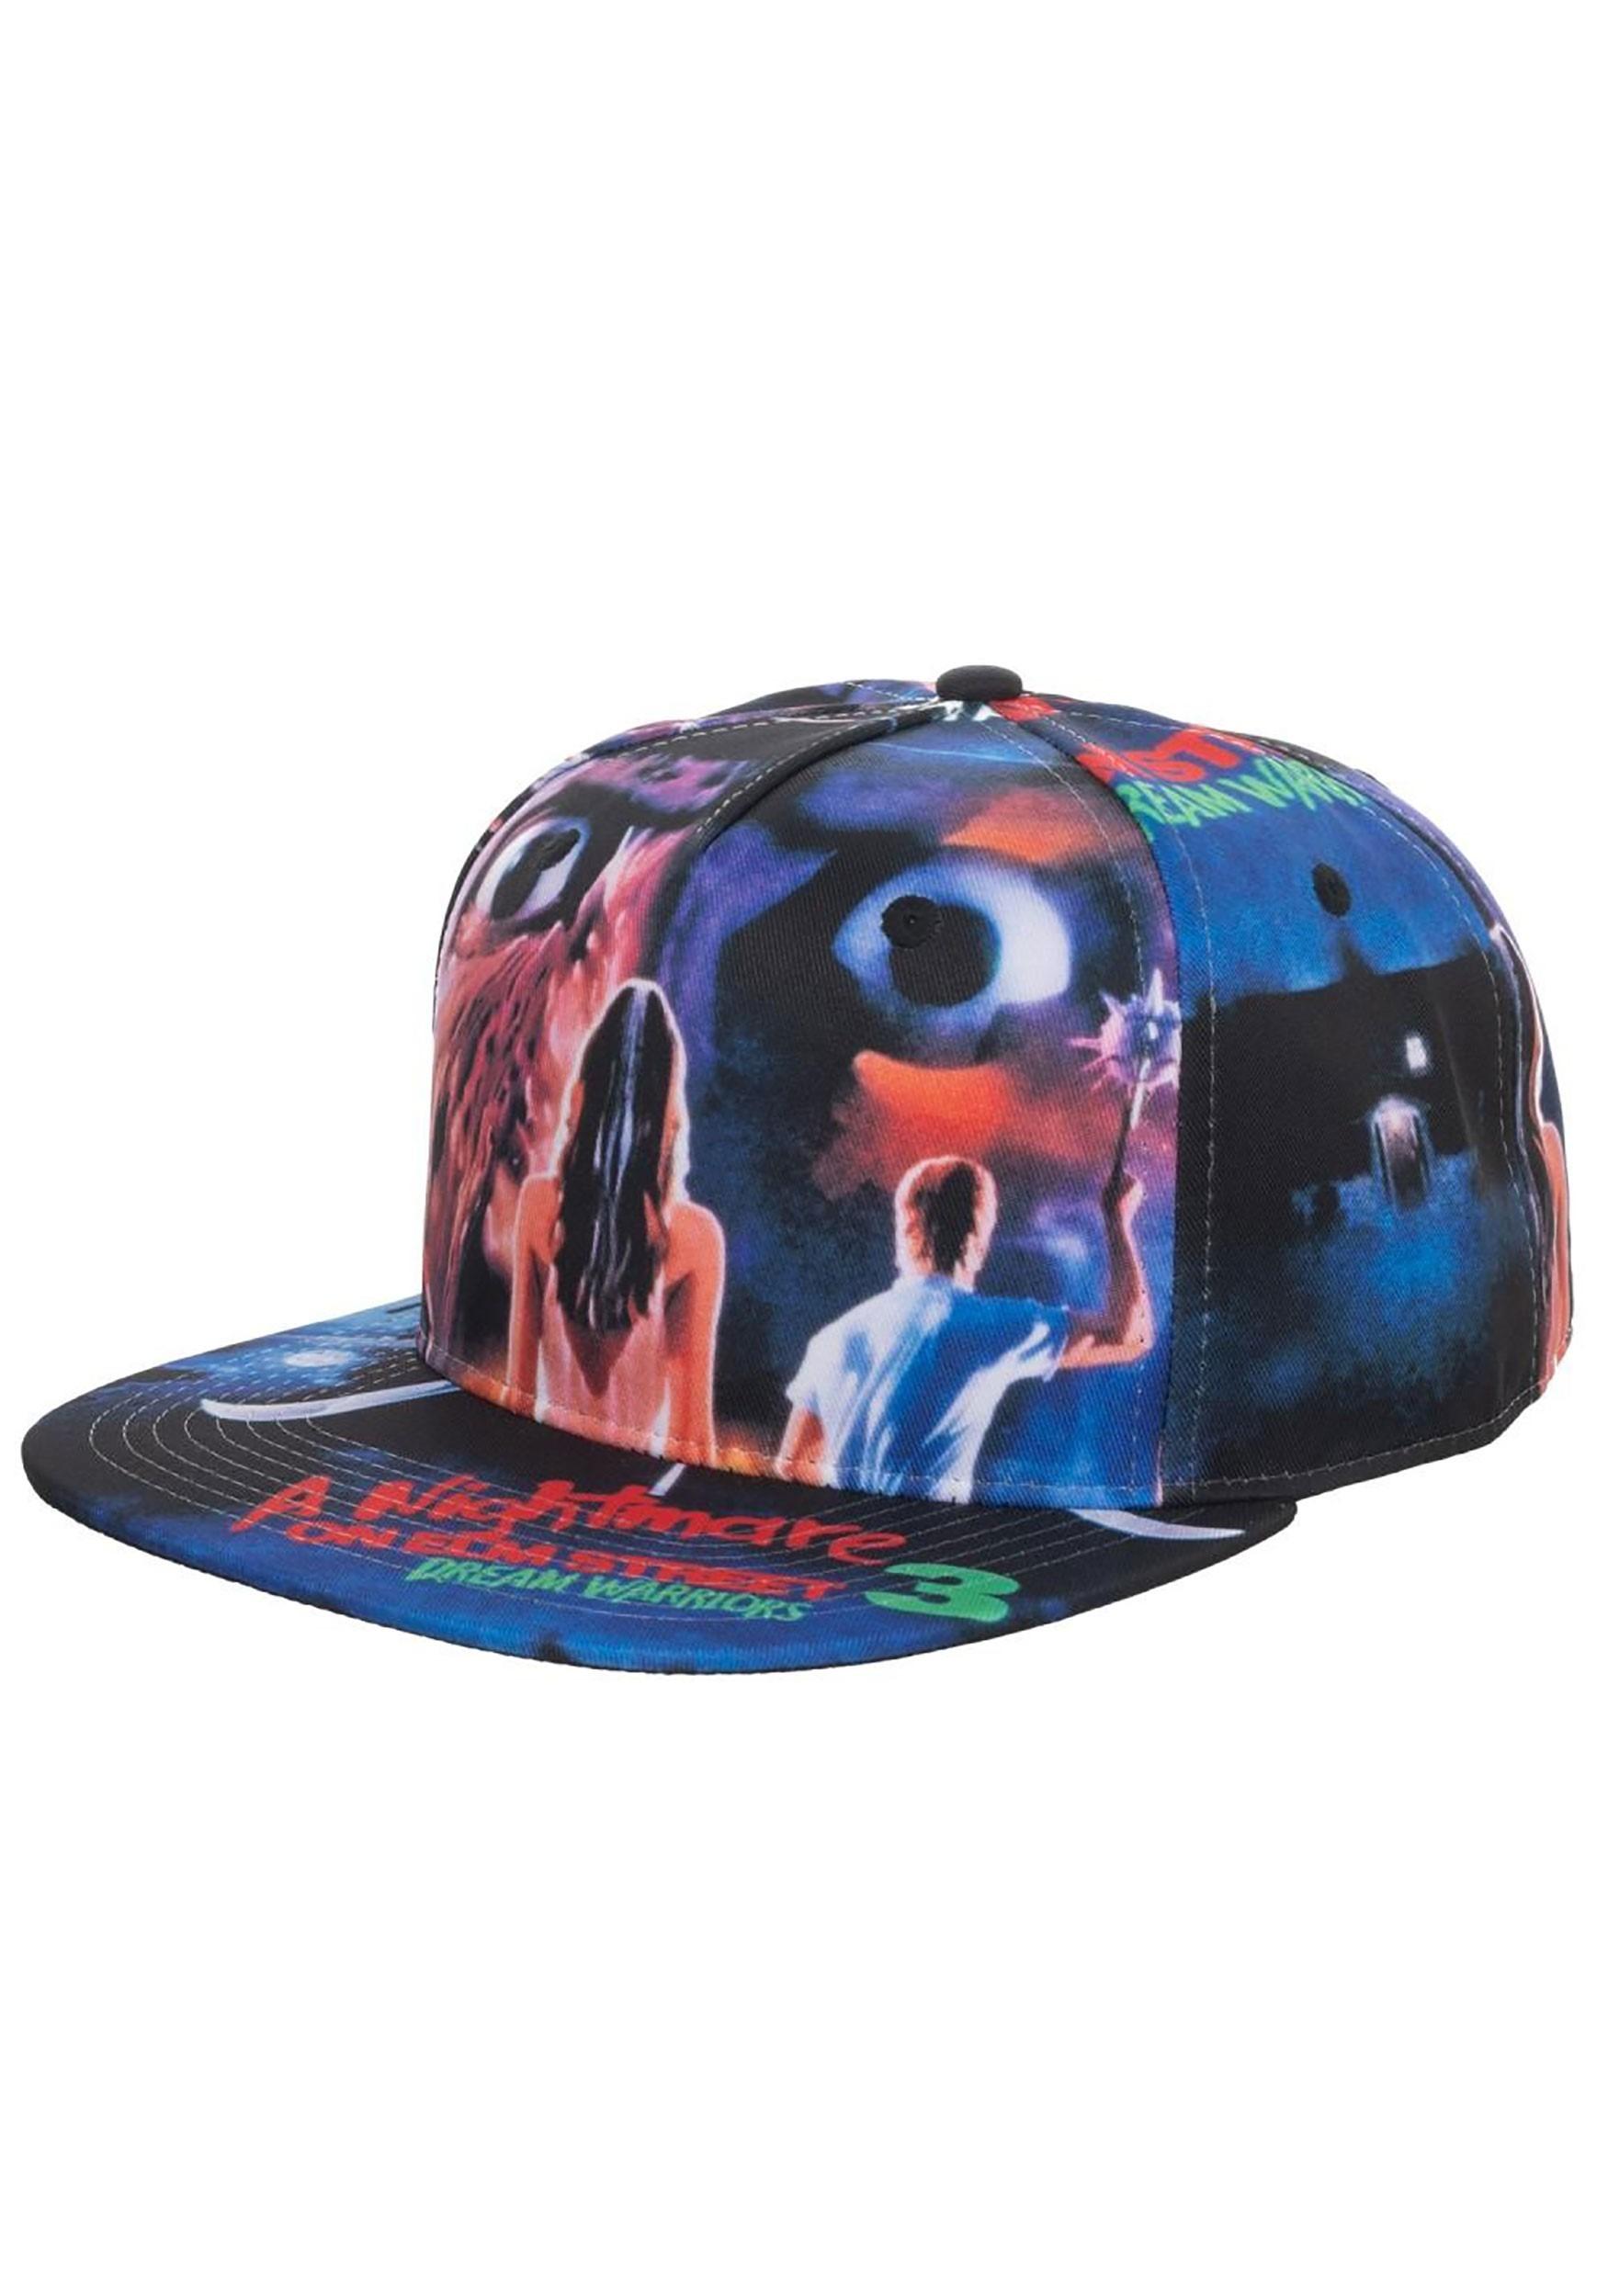 Adult Nightmare on Elm Street Poster Snapback Cap